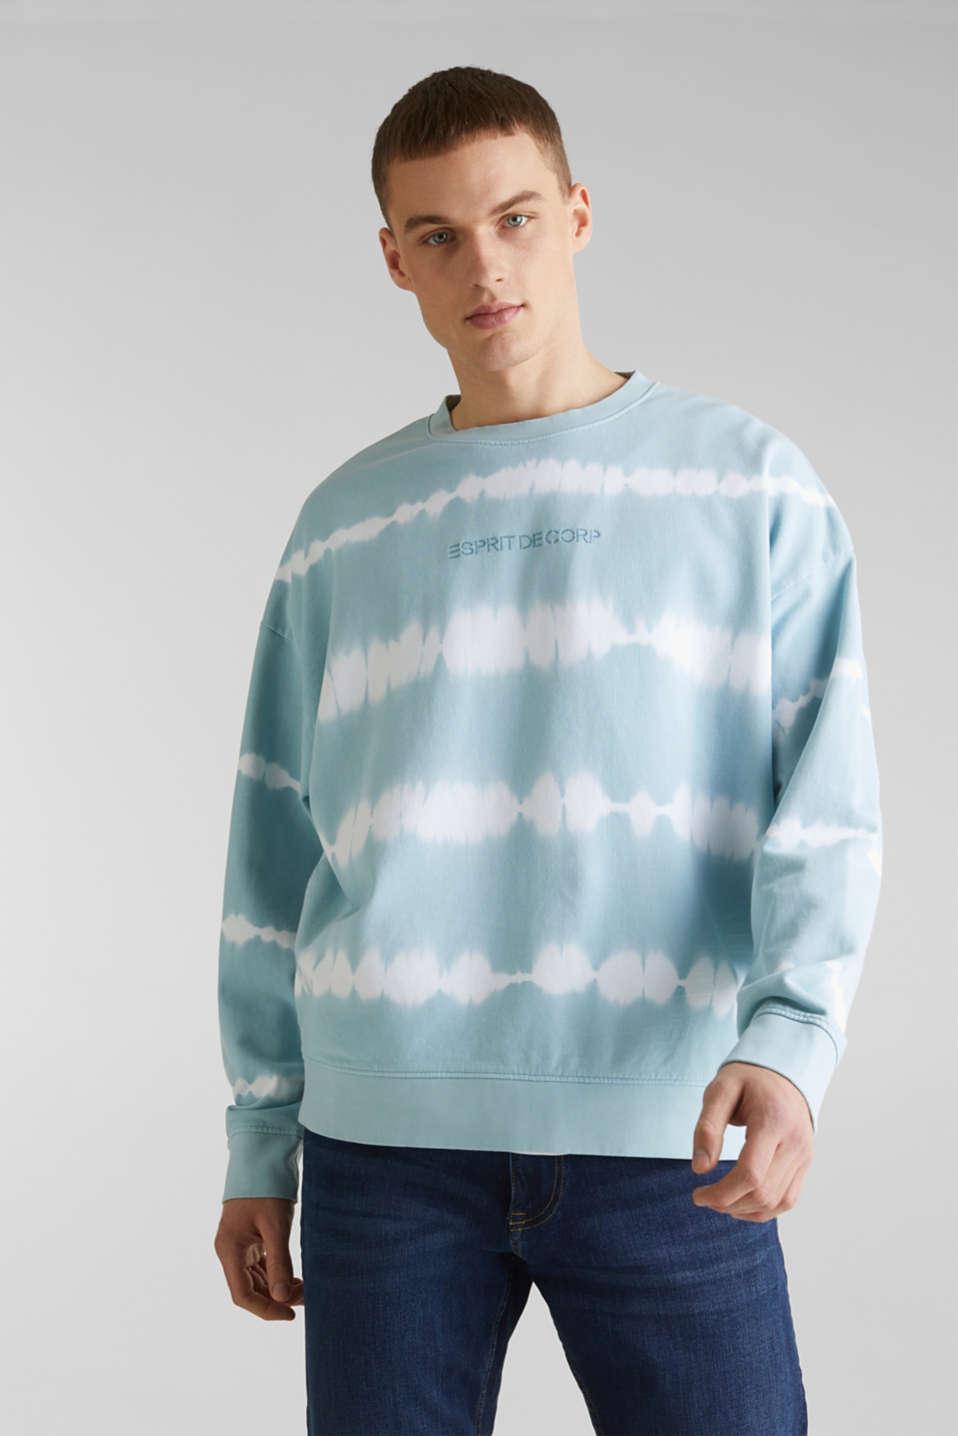 Batik sweatshirt with organic cotton, LIGHT BLUE 4, detail image number 0